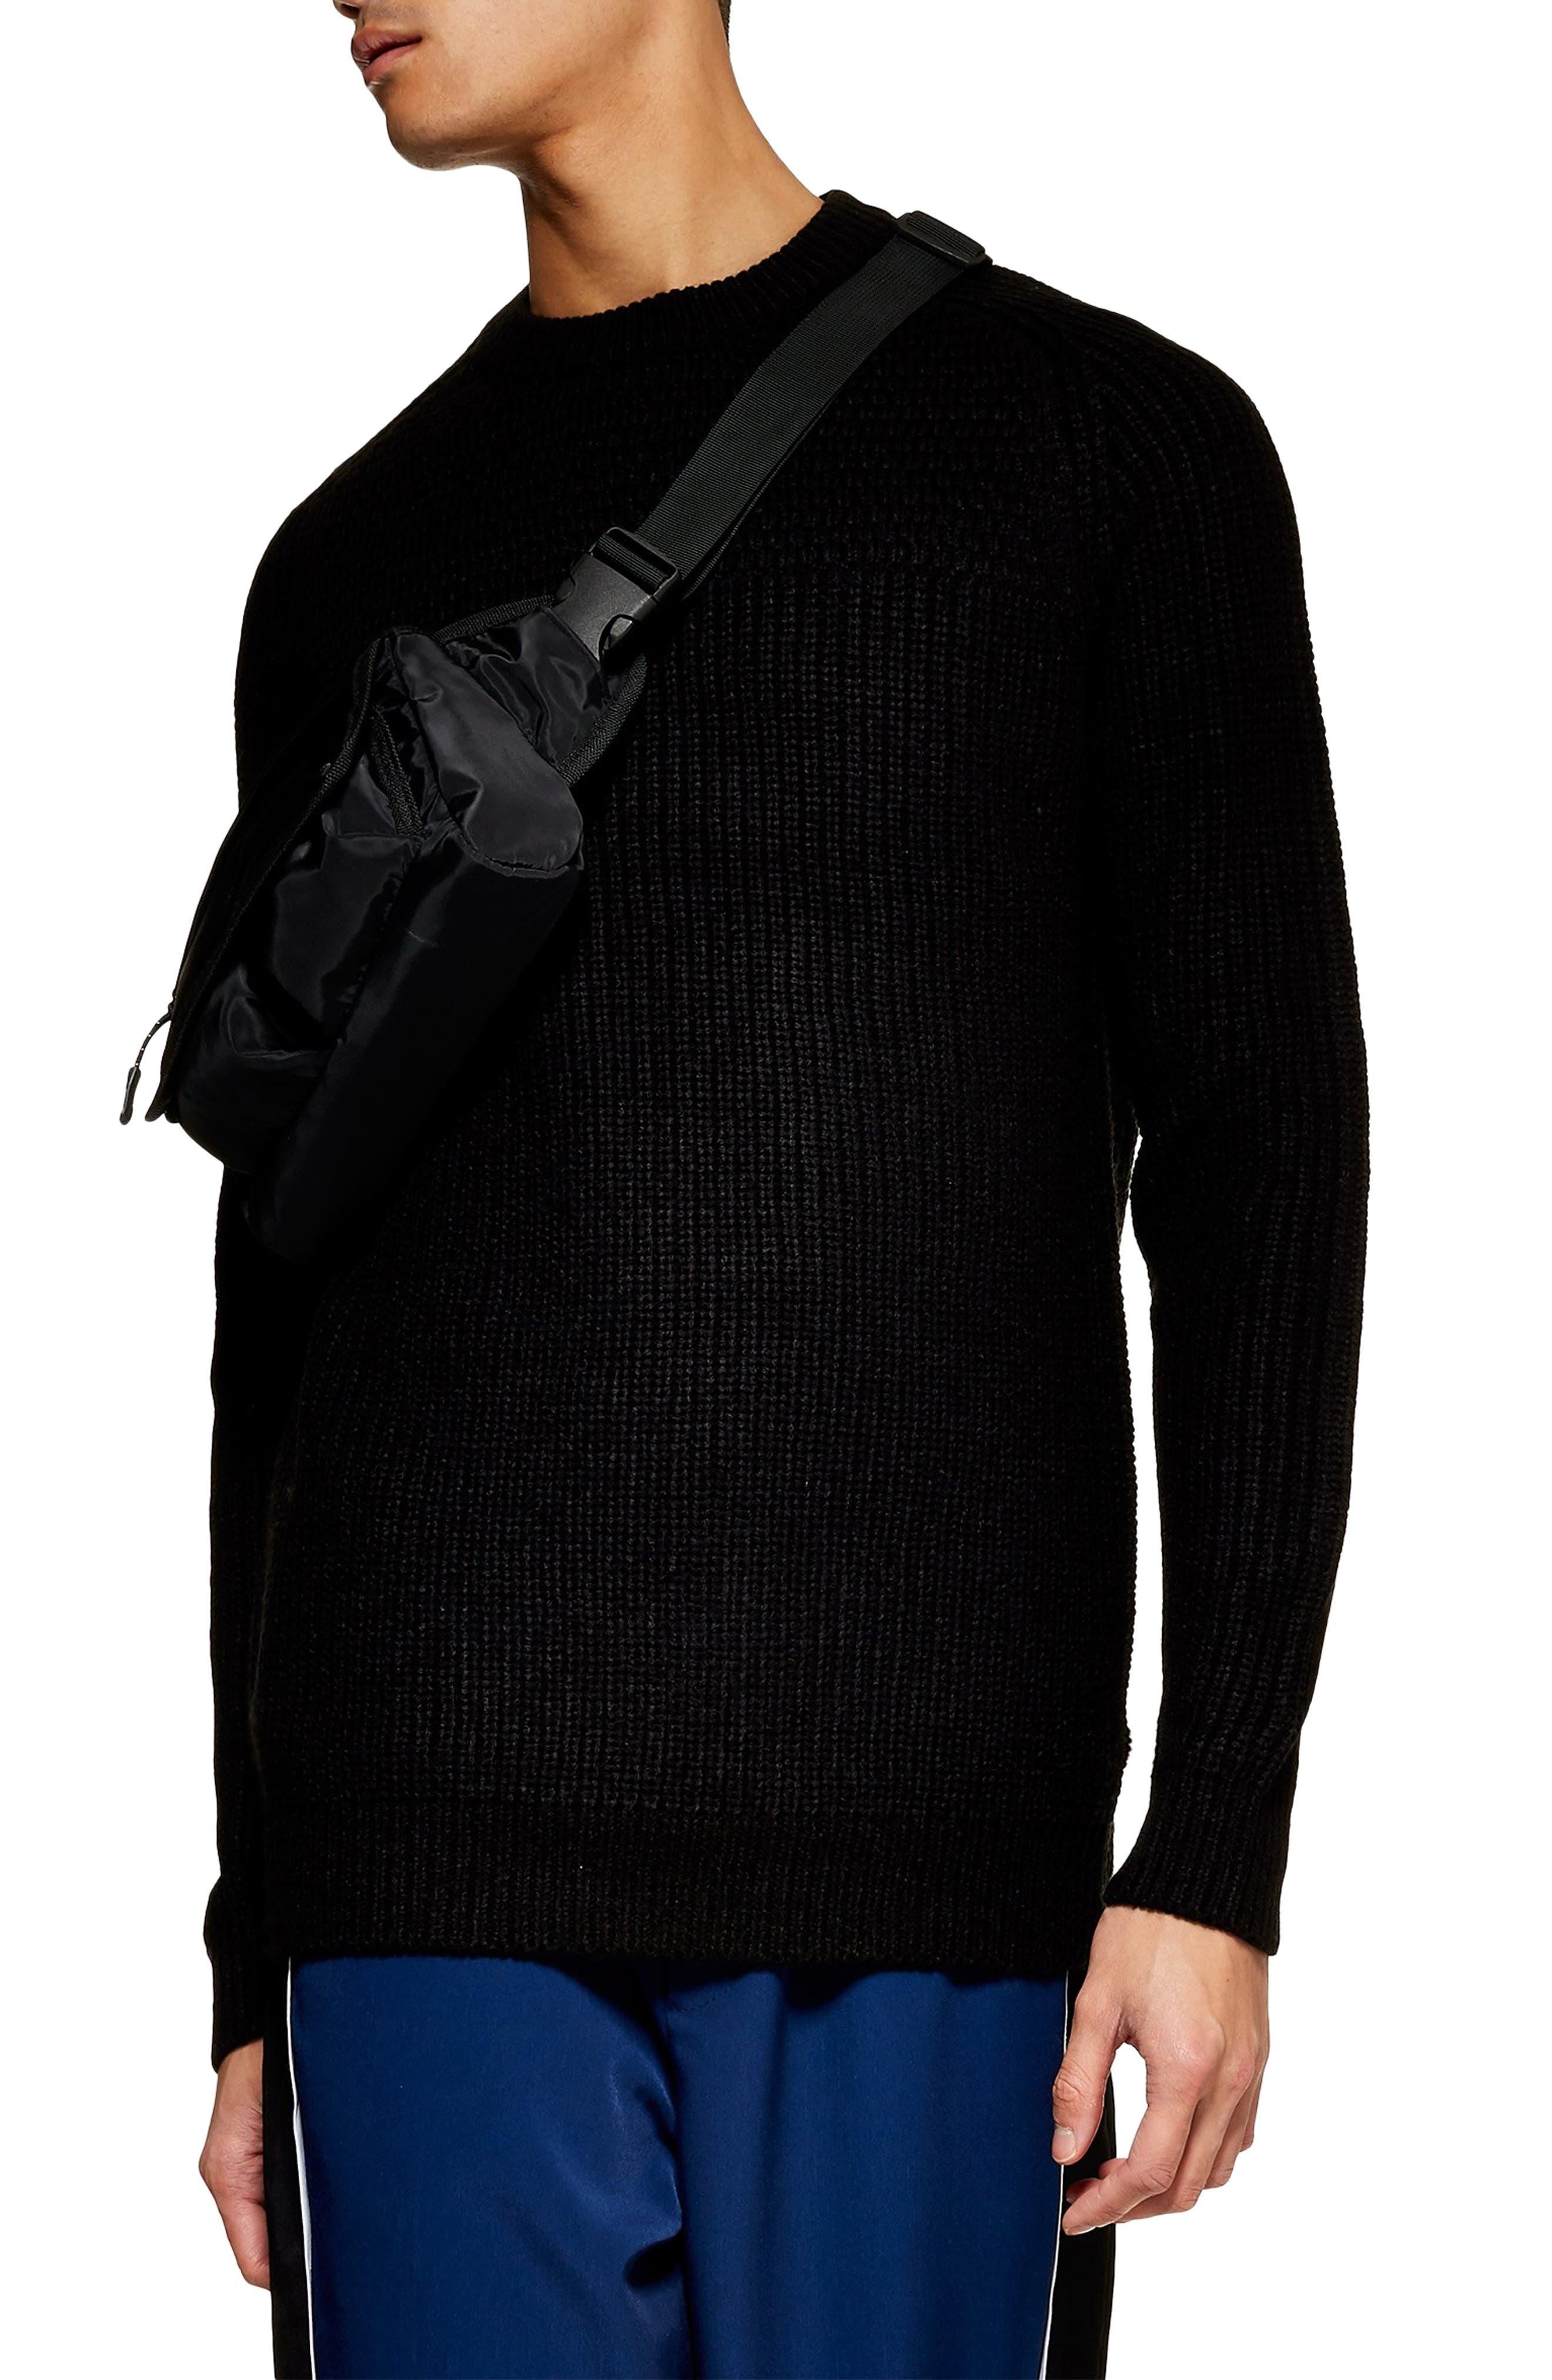 Topman Mixed Stitch Classic Crewneck Sweater, Black